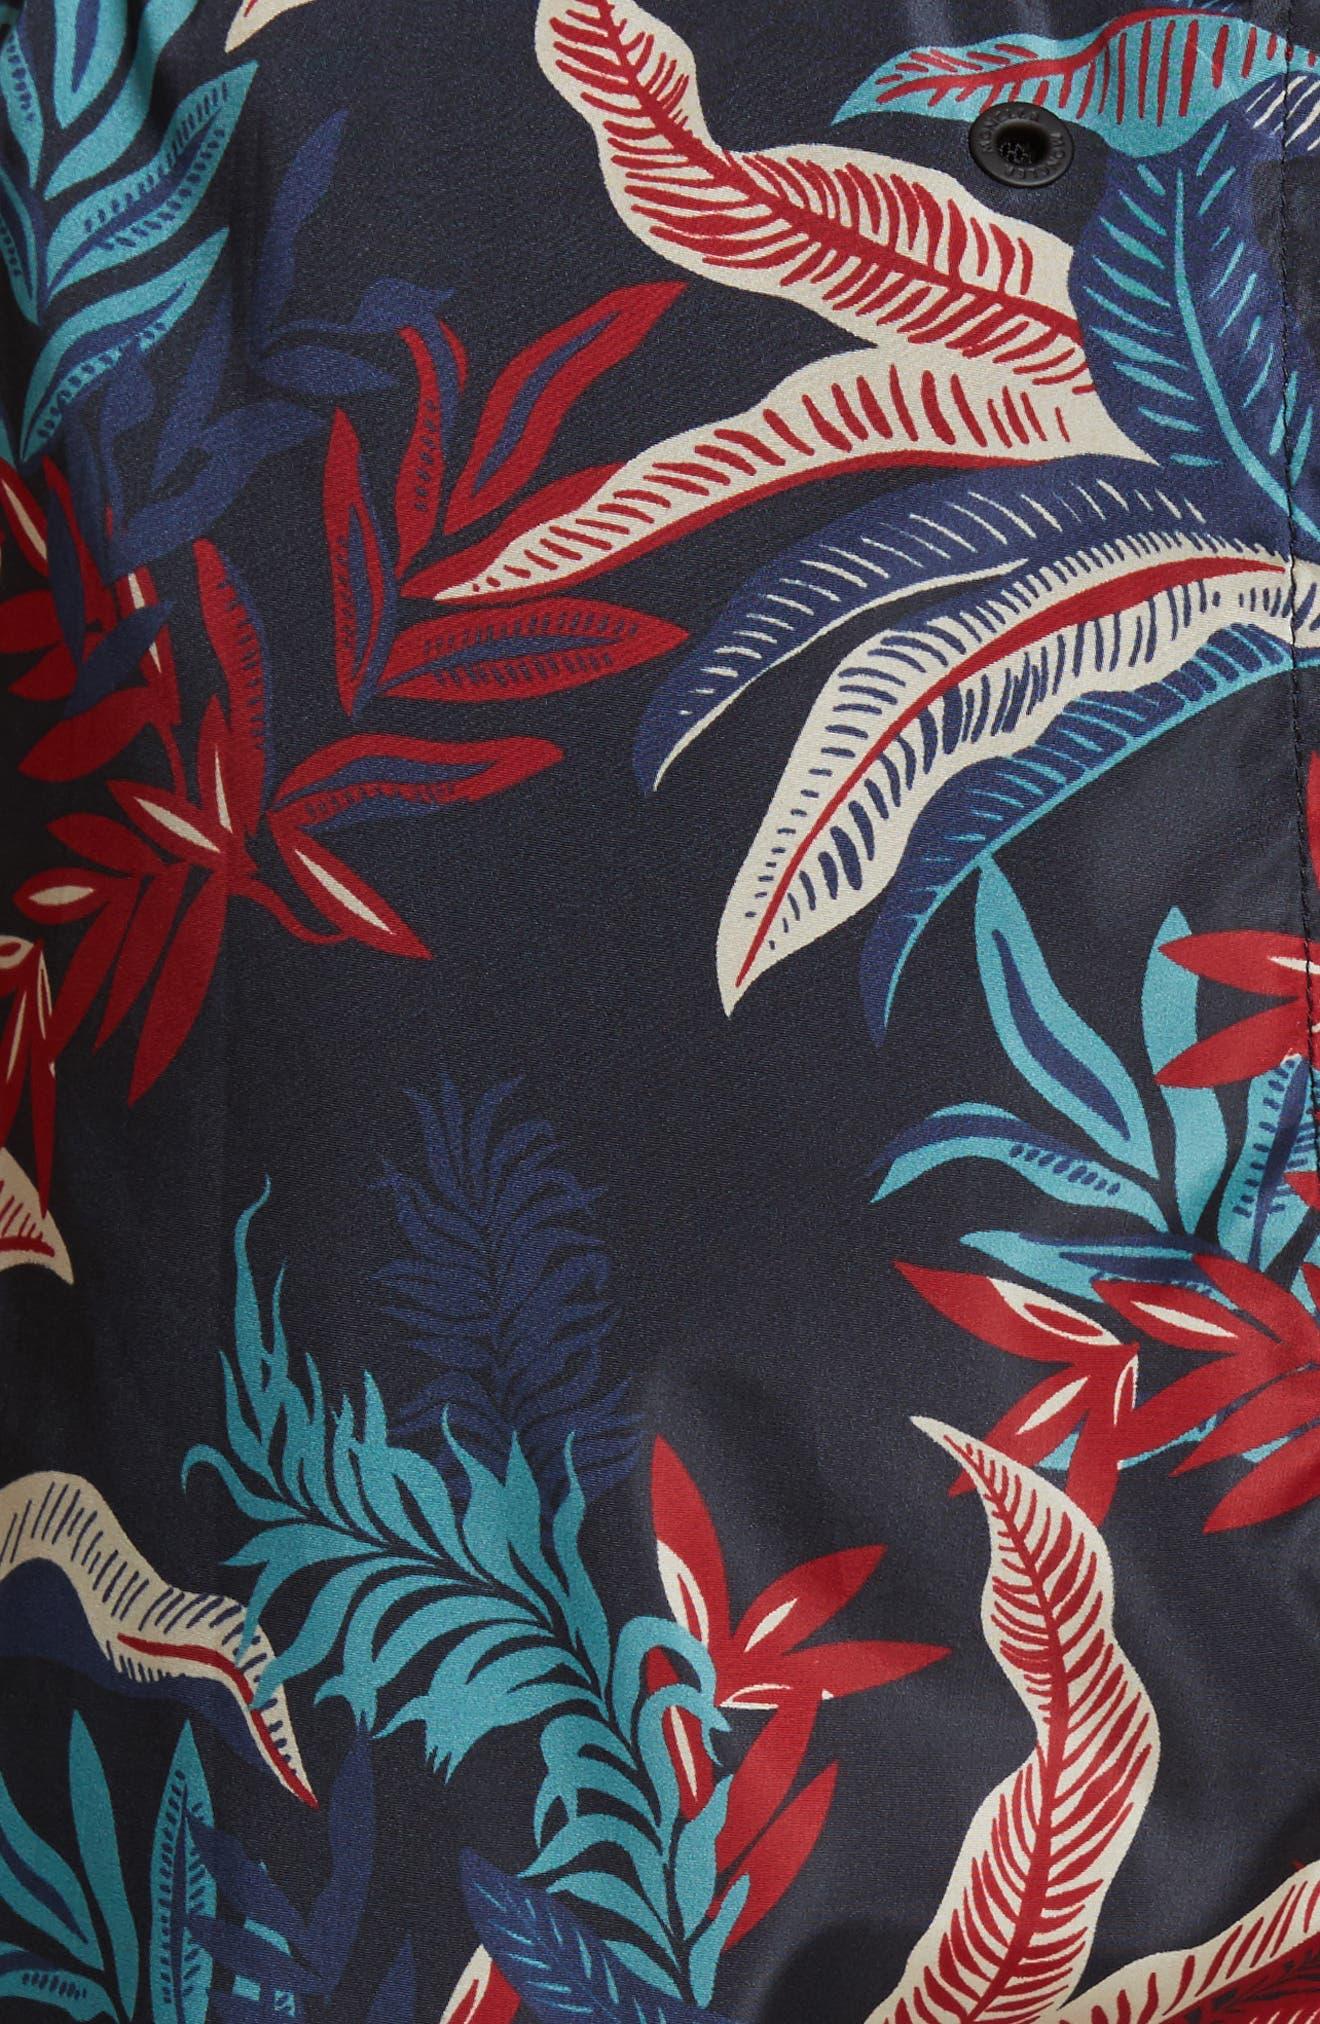 Floral Print Swim Trunks,                             Alternate thumbnail 5, color,                             409